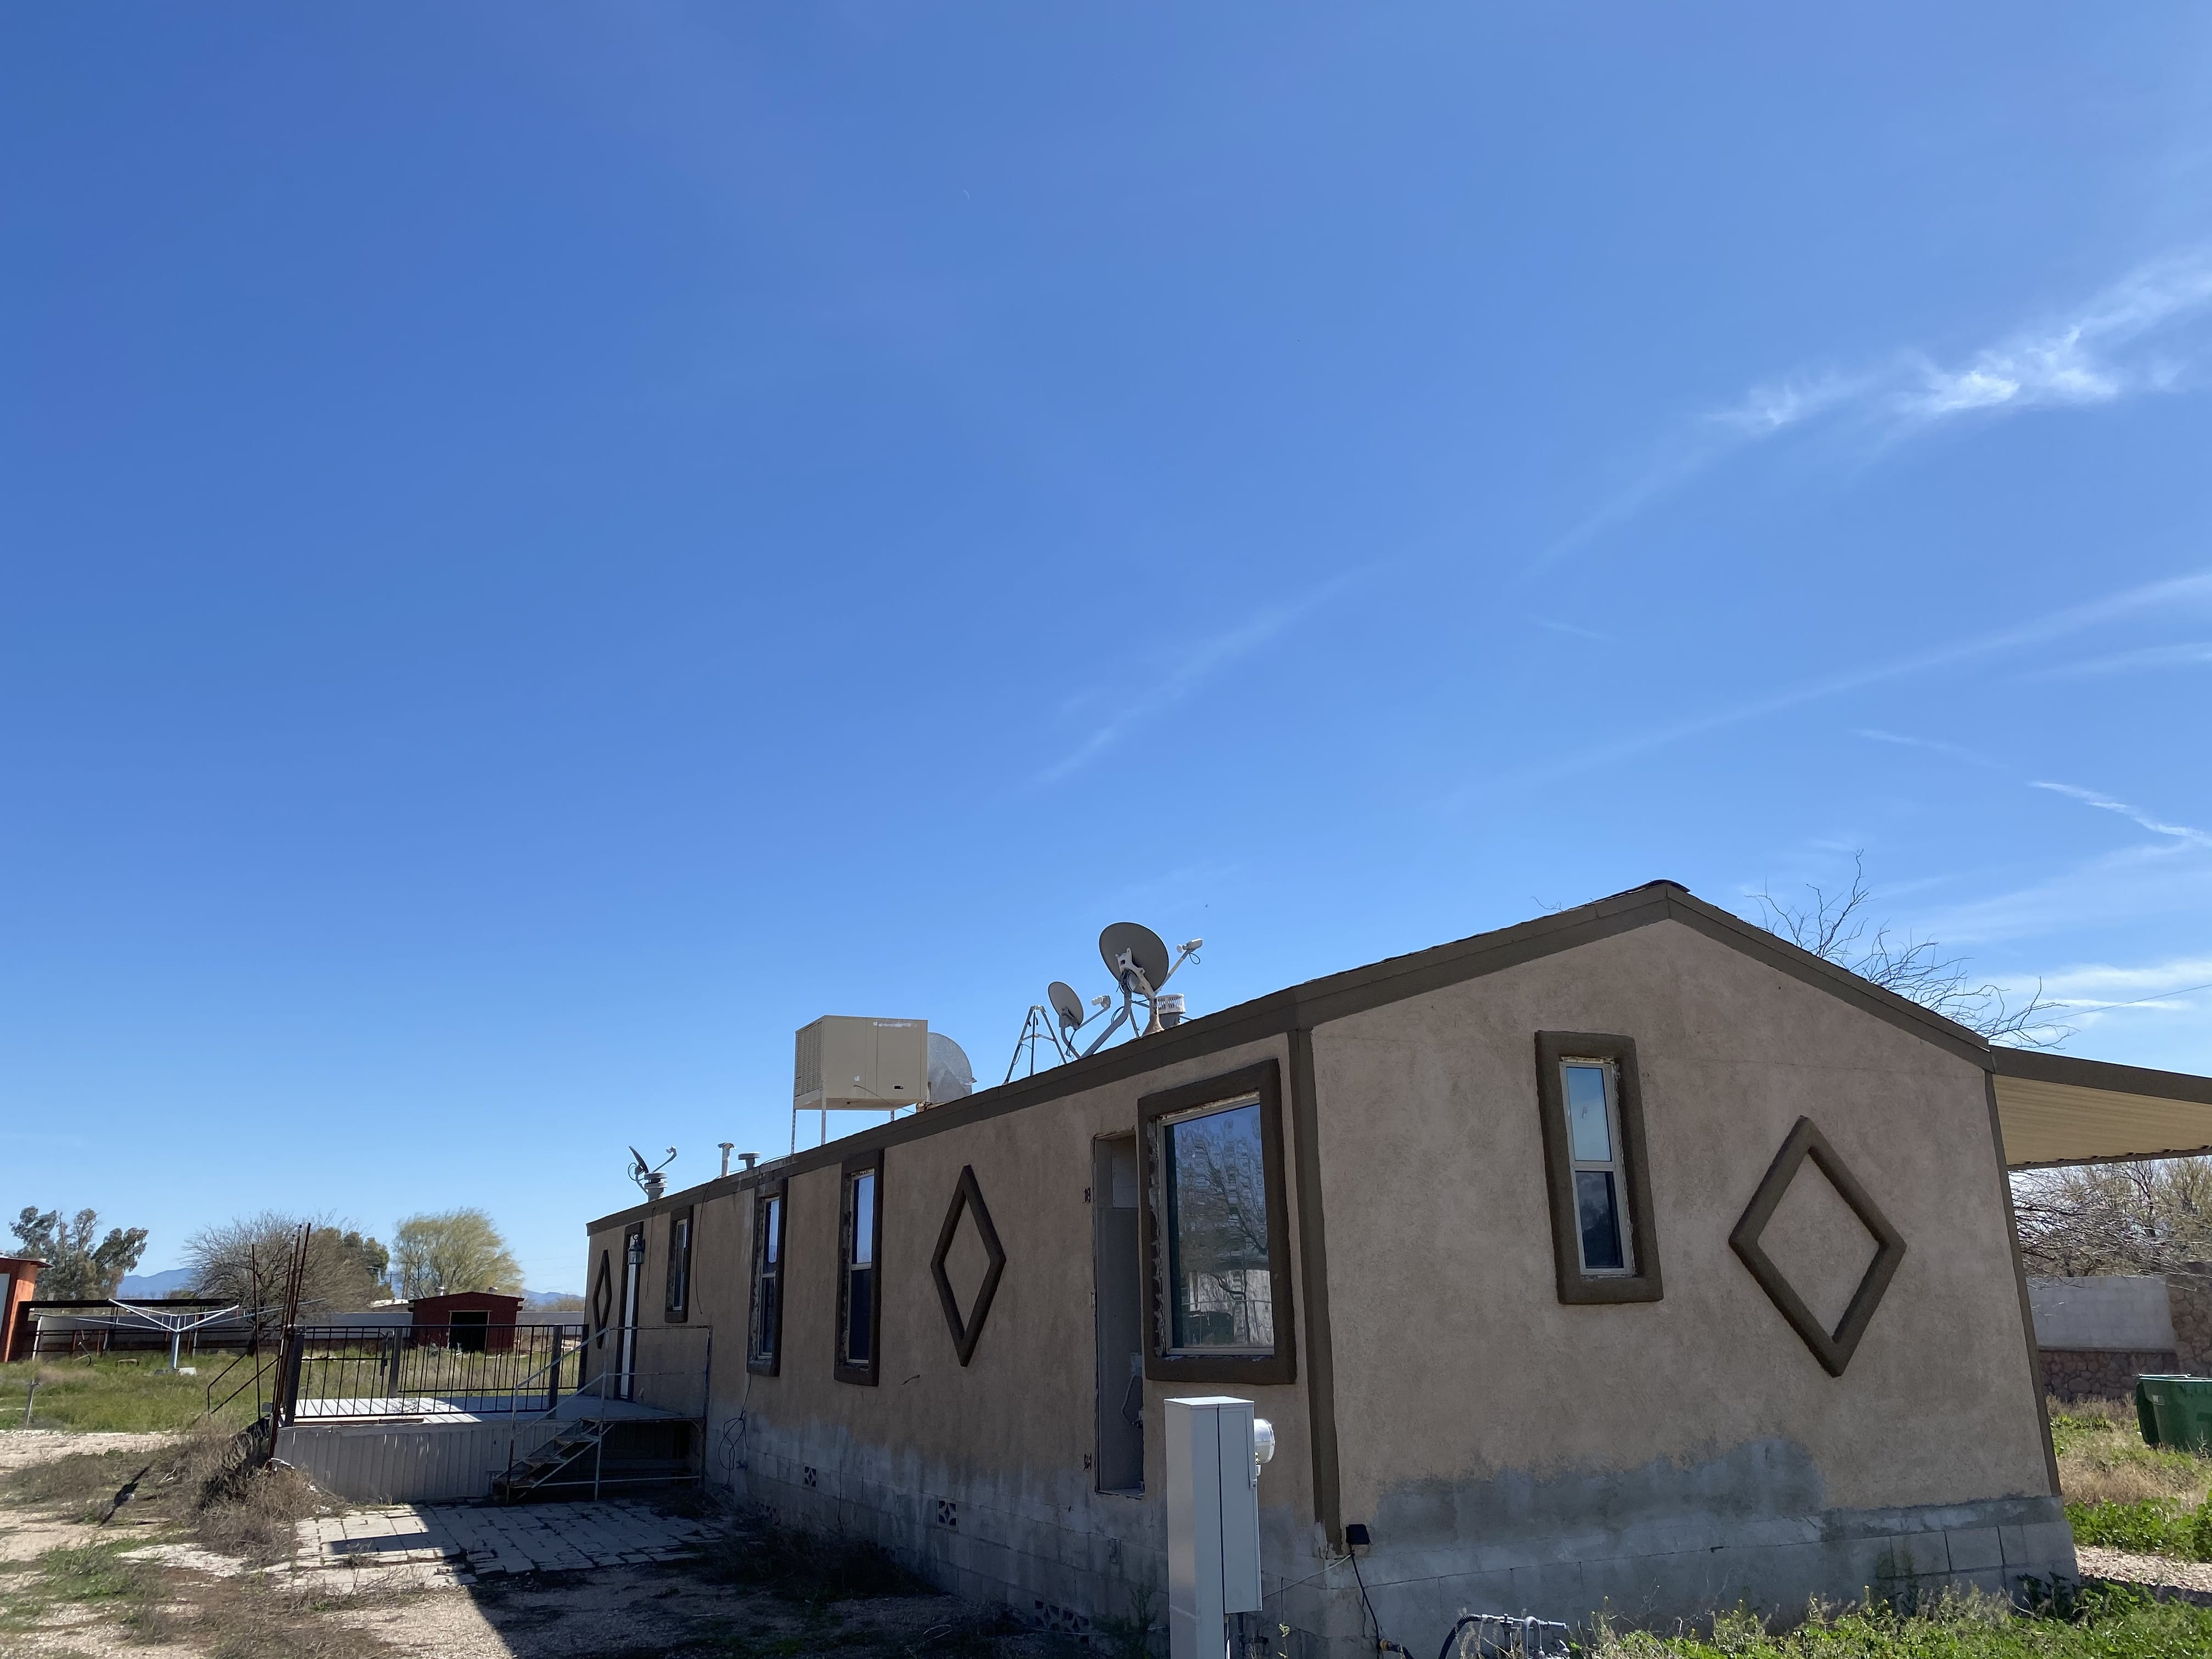 7065 S Sandpiper Ave, Tucson, AZ (2a)